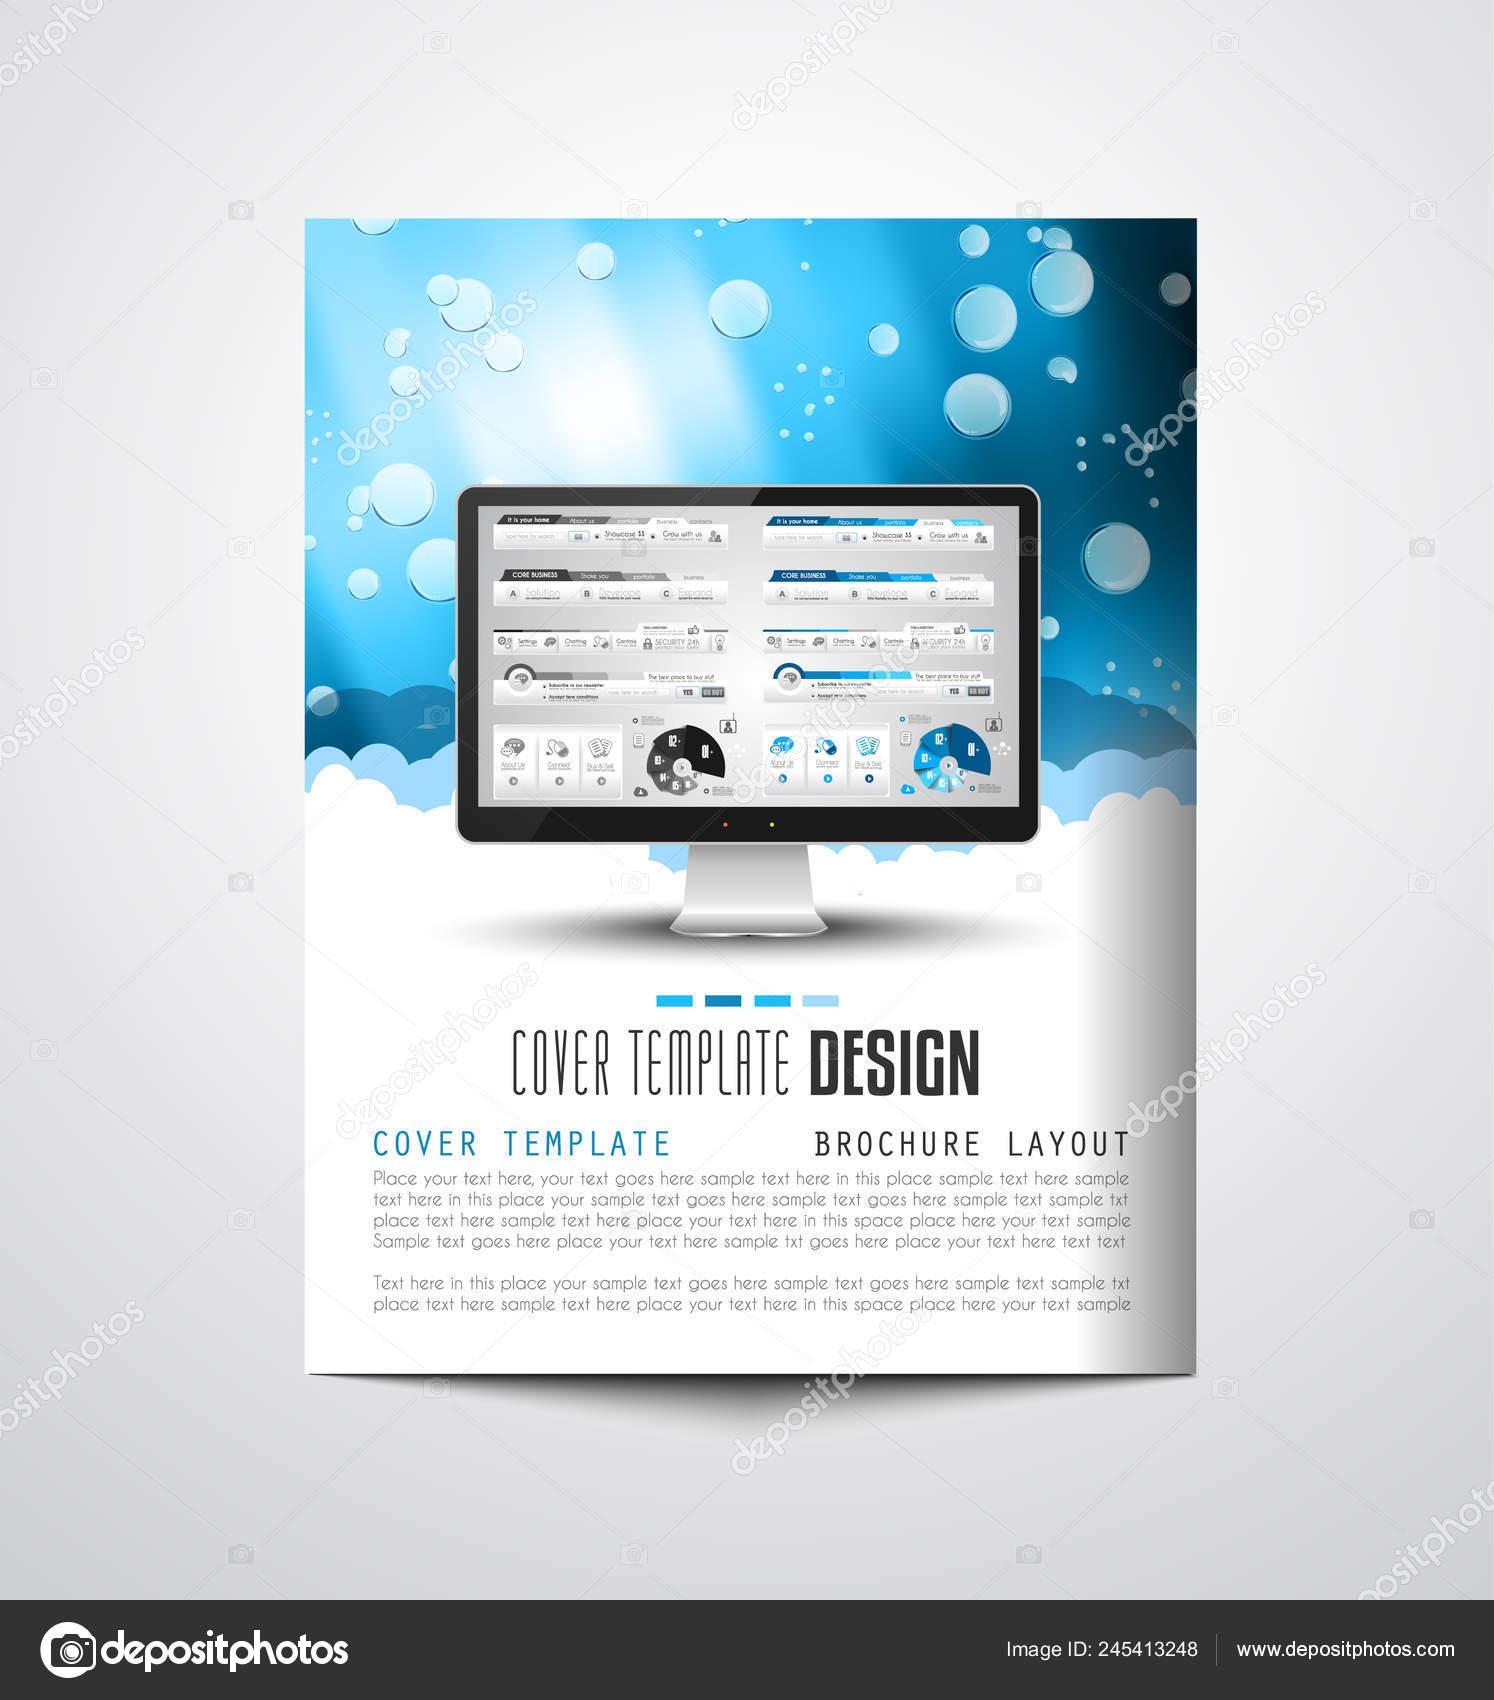 Brochure Template Flyer Design Depliant Cover Business